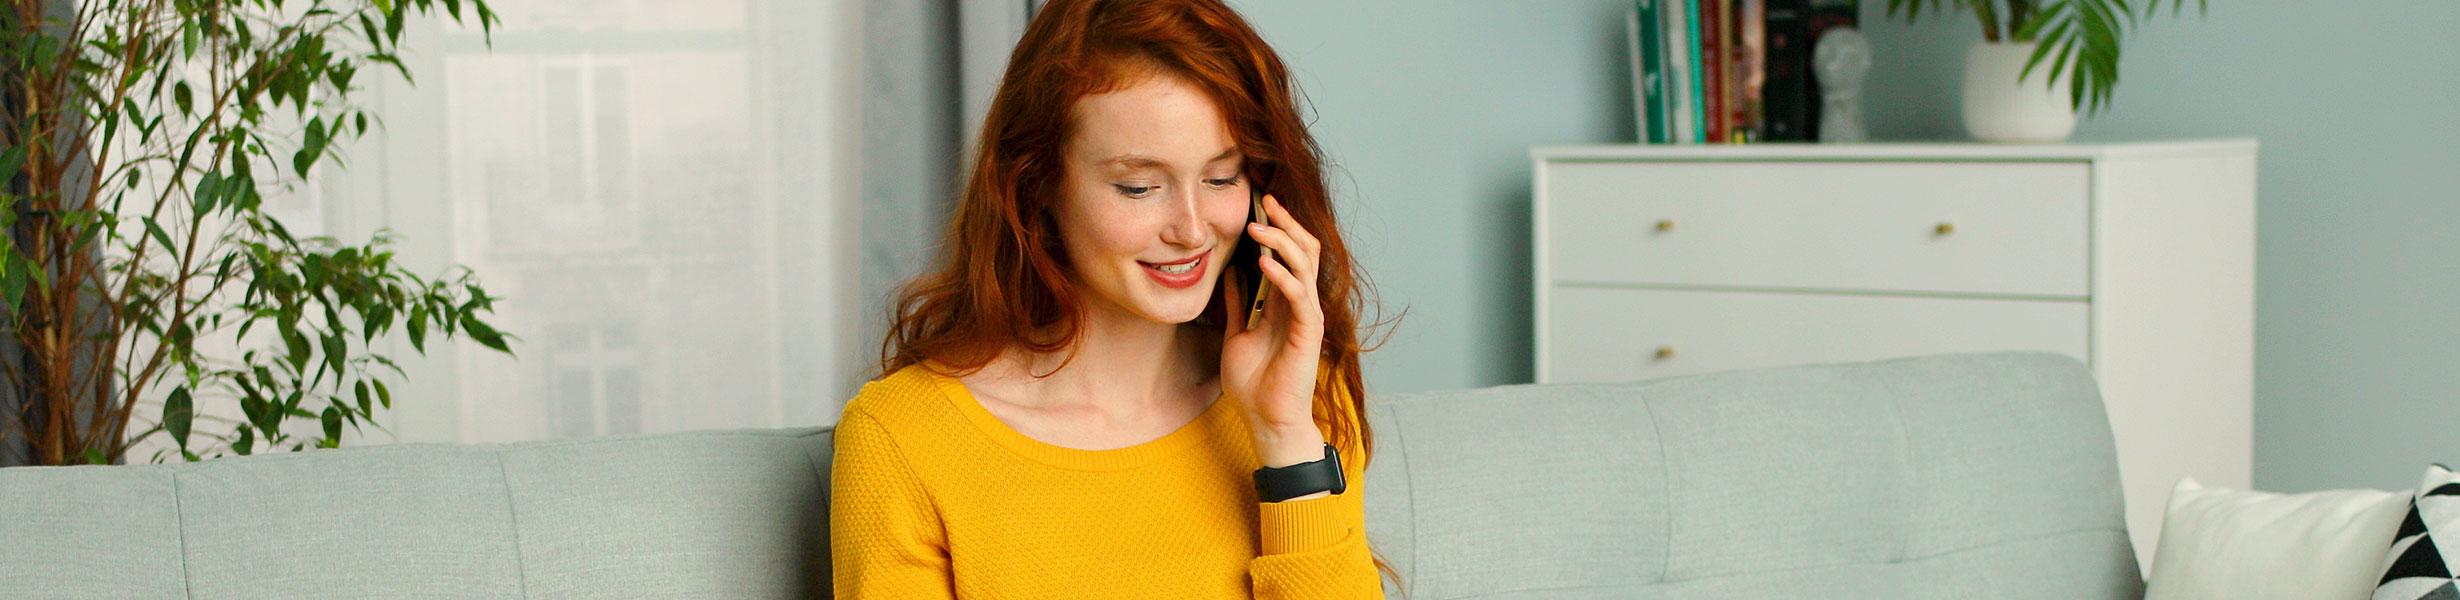 Woman answering phone call